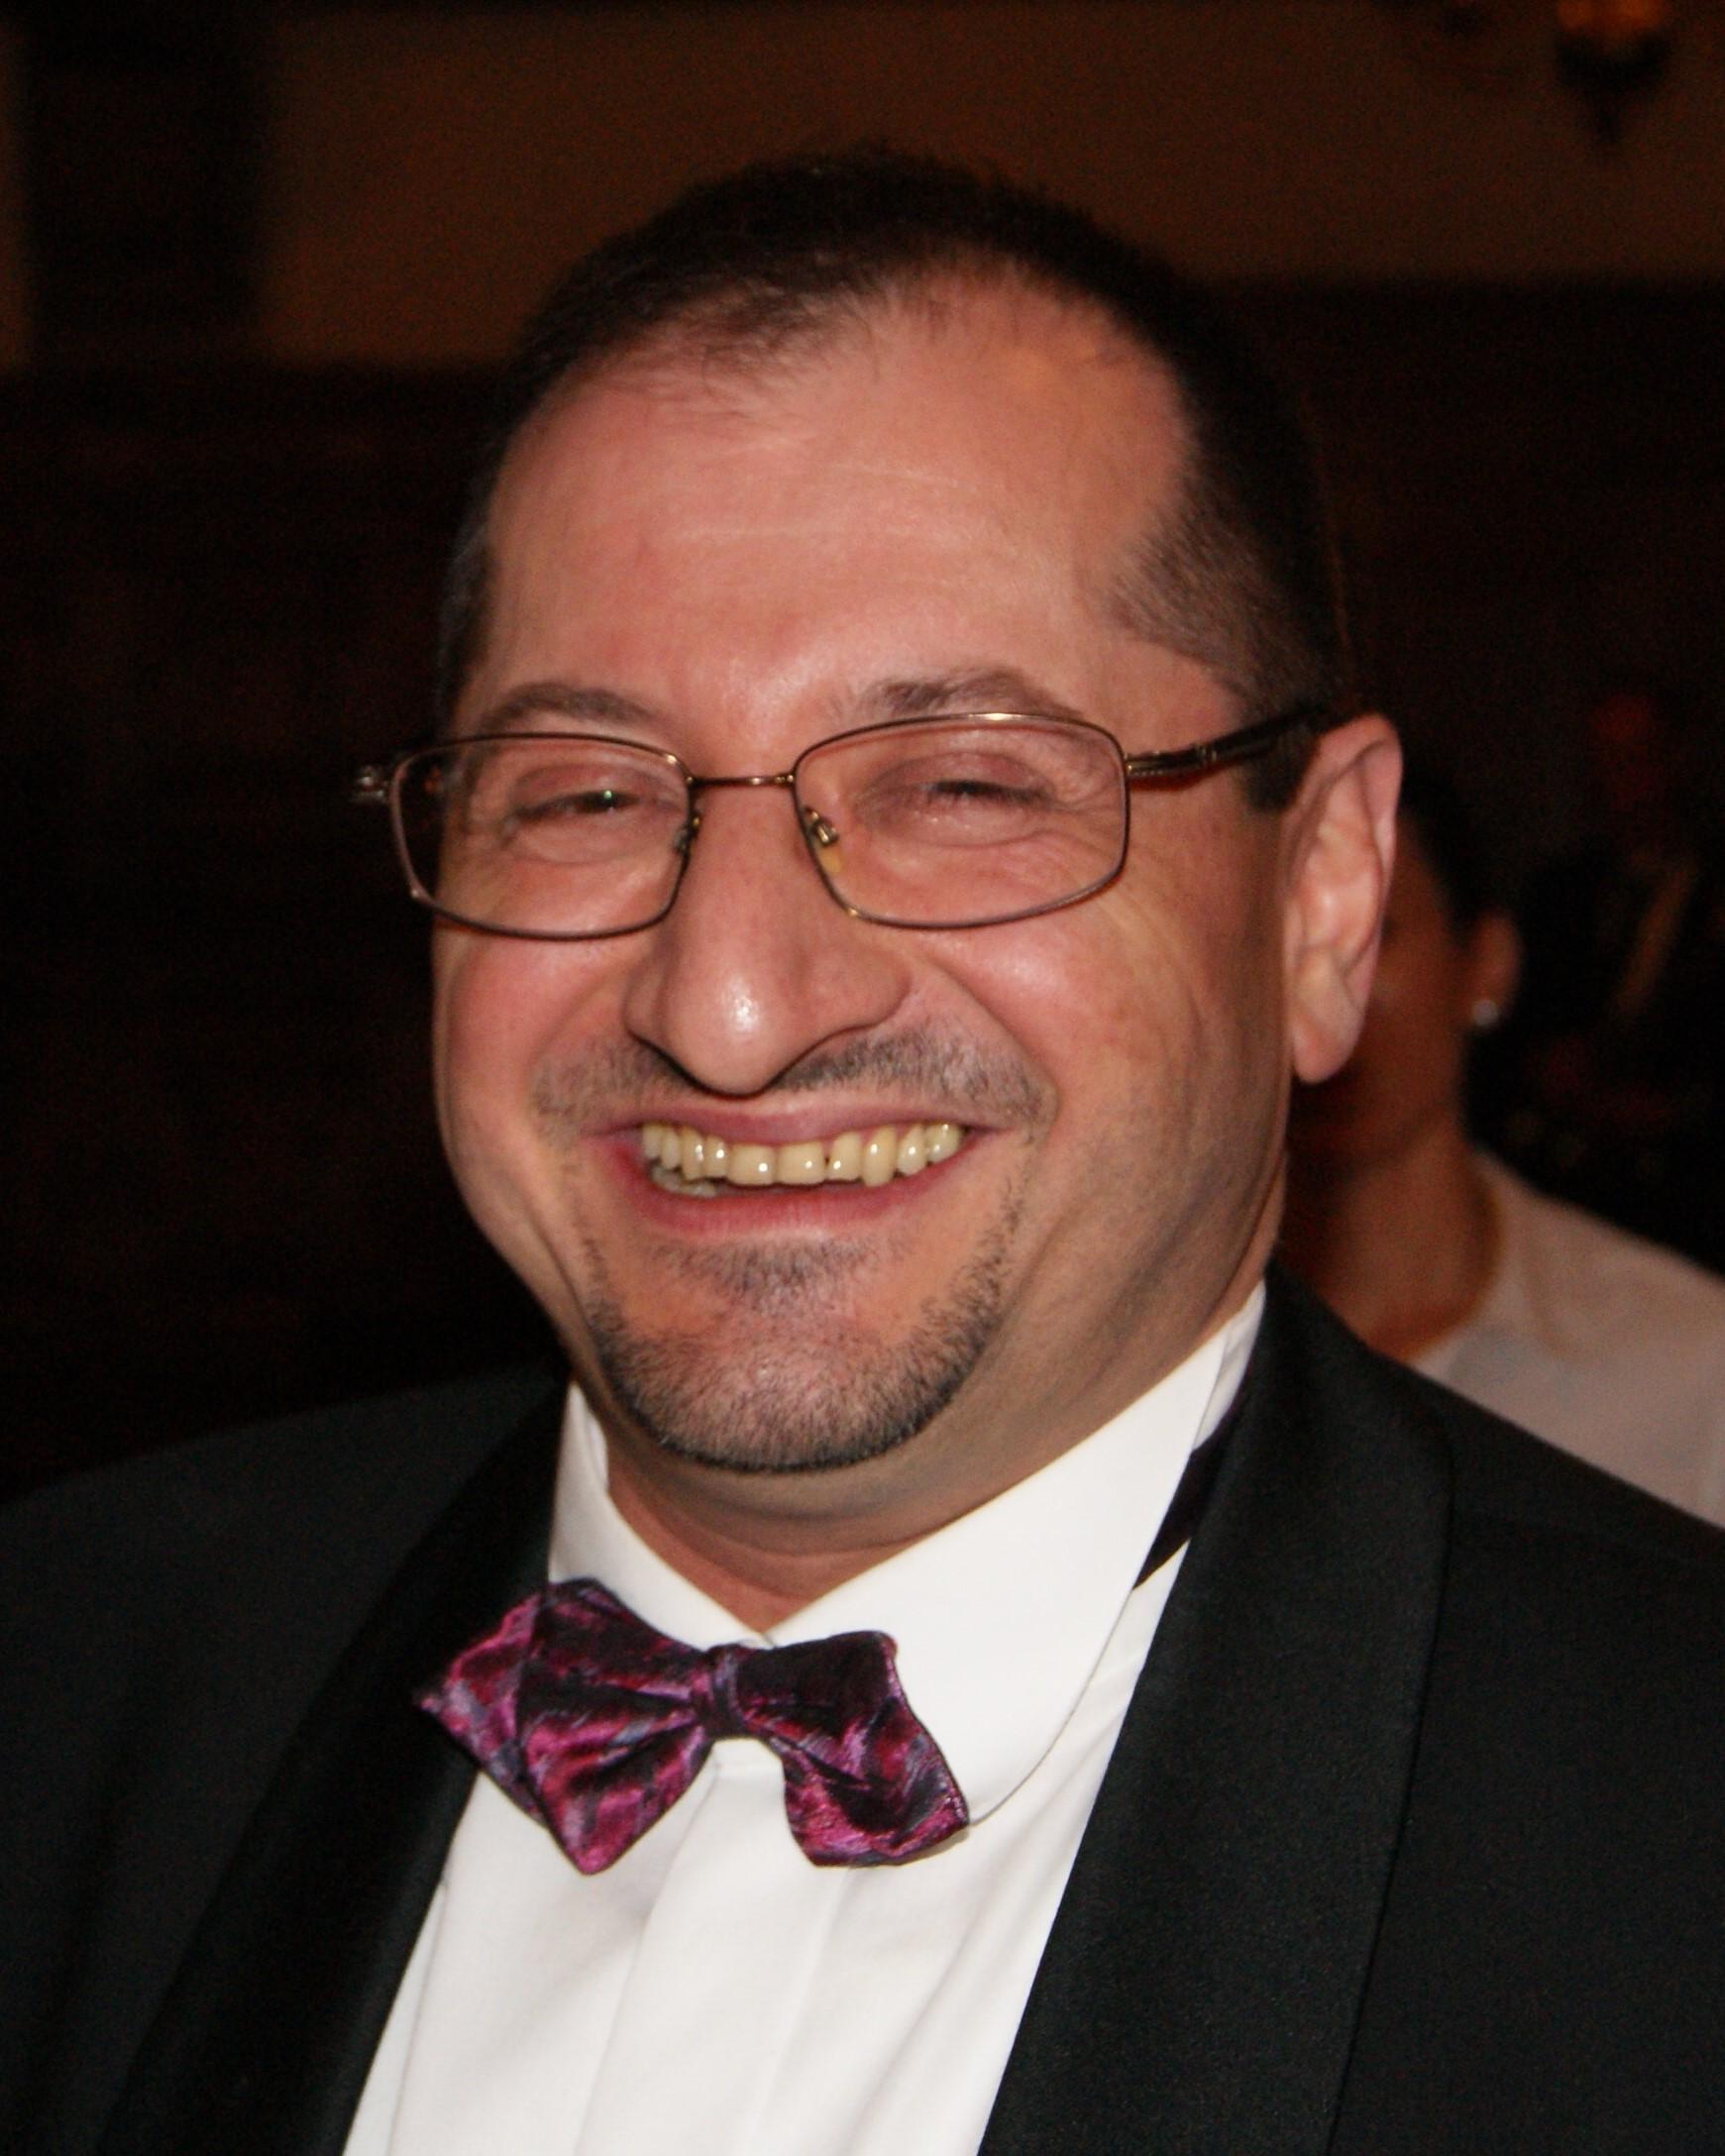 Hans Isler jun. (1969 - 2018)